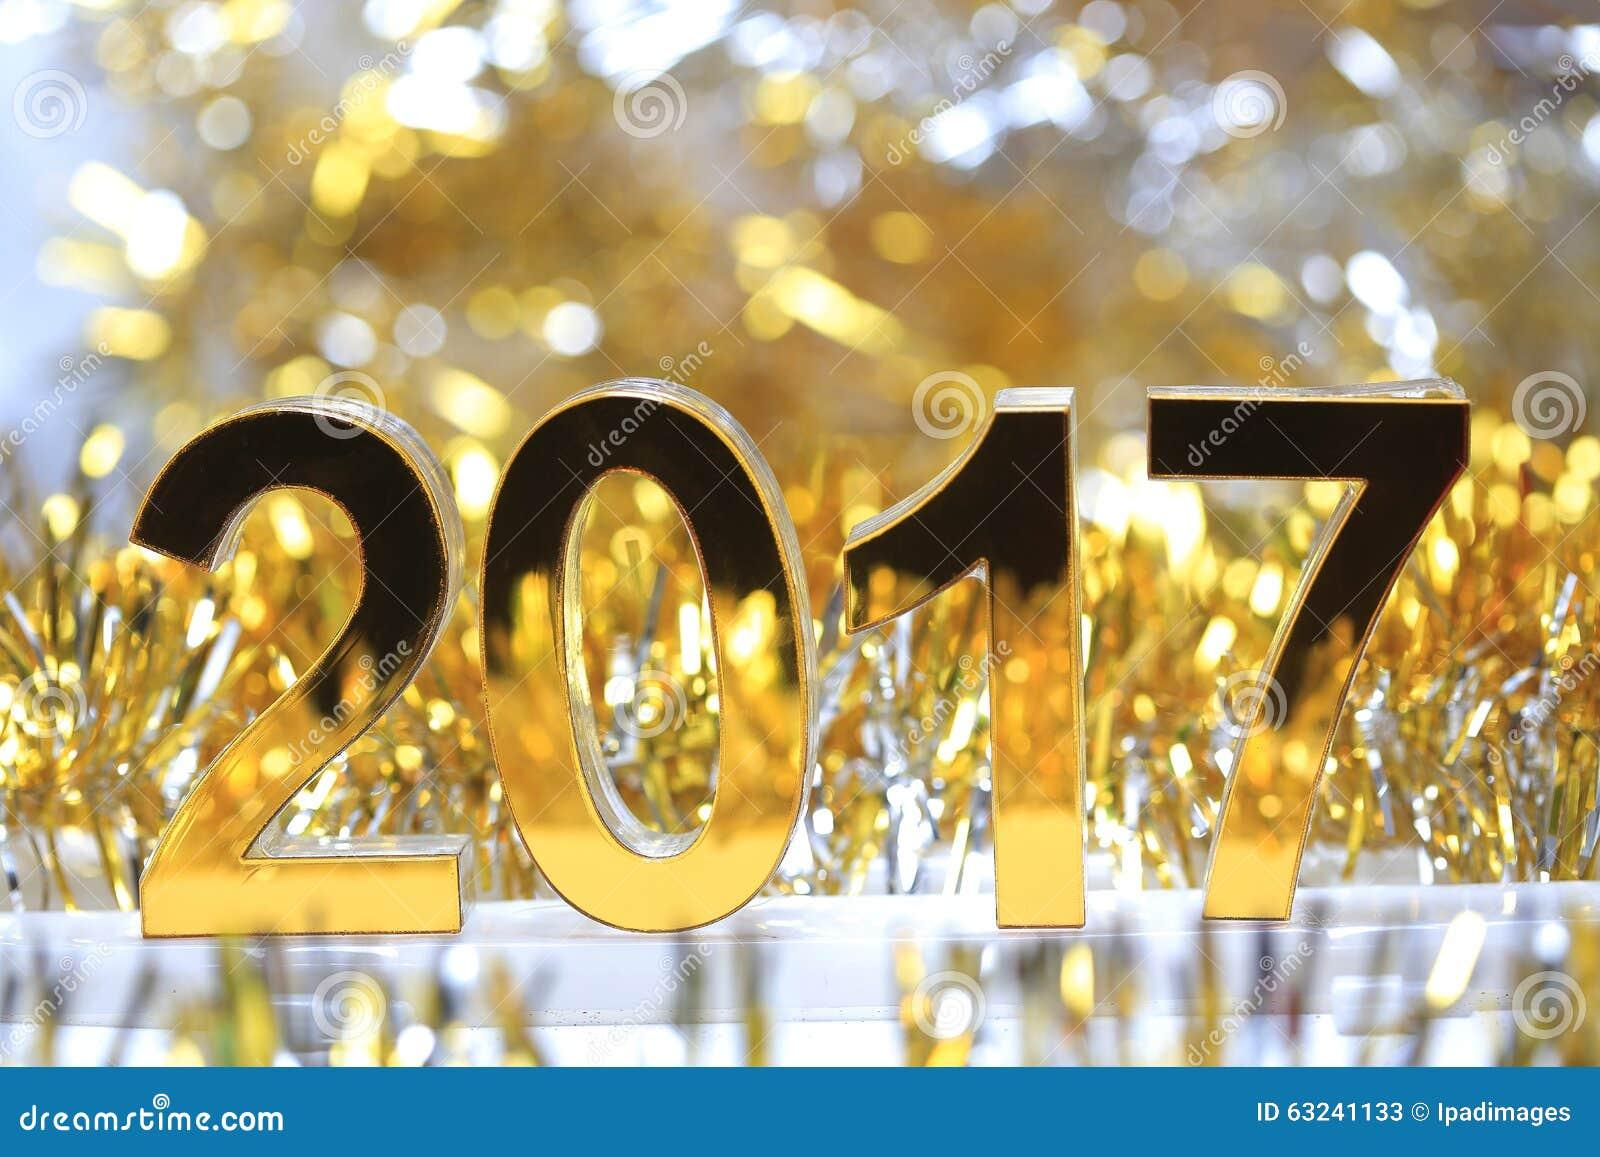 Icon 2017 Stock Illustration - Image: 81427402